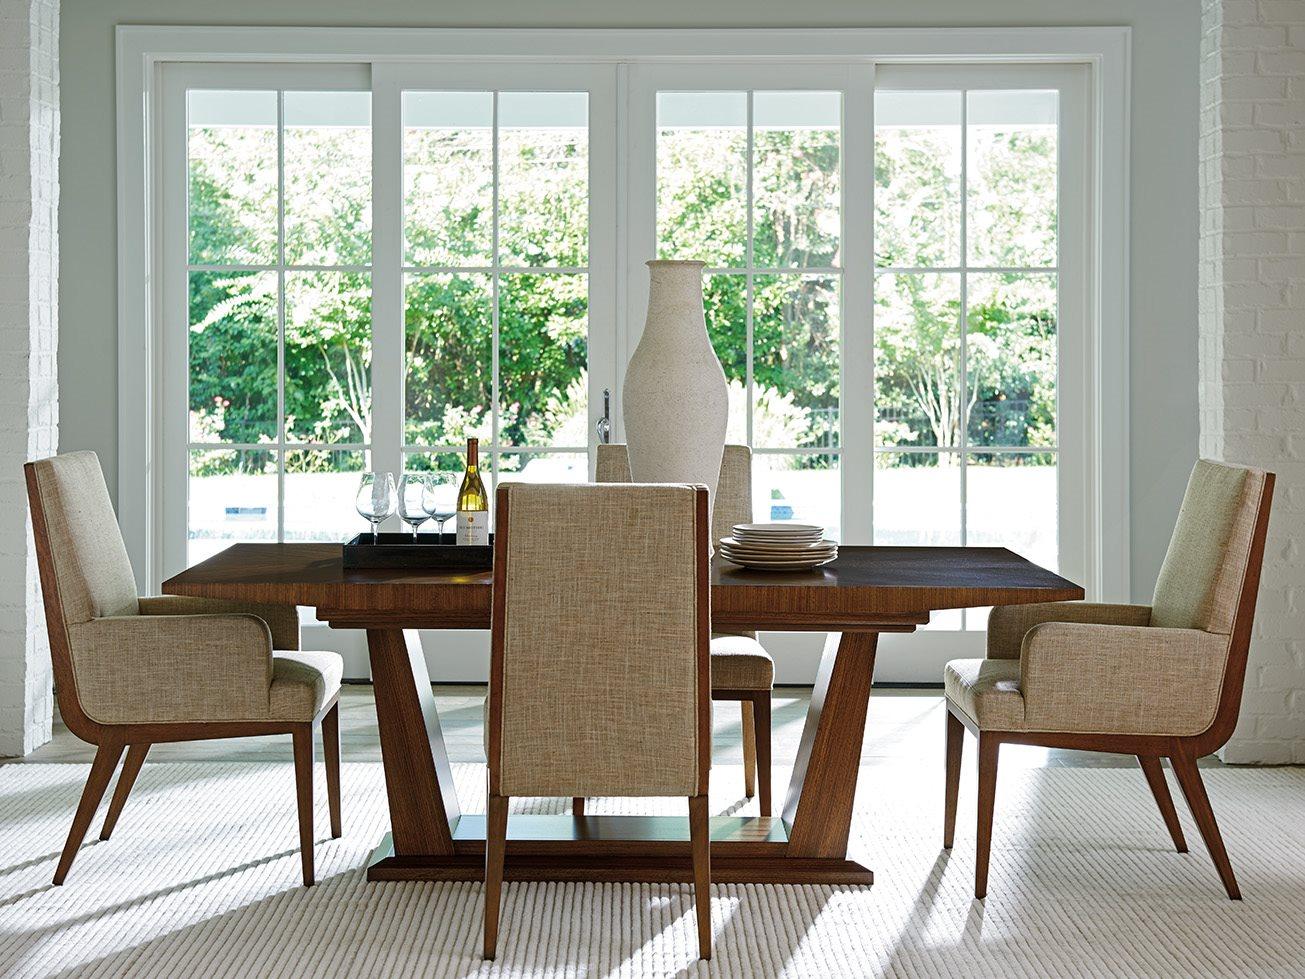 lexington dining room | Lexington Kitano Dining Room Set | LX734877CSET